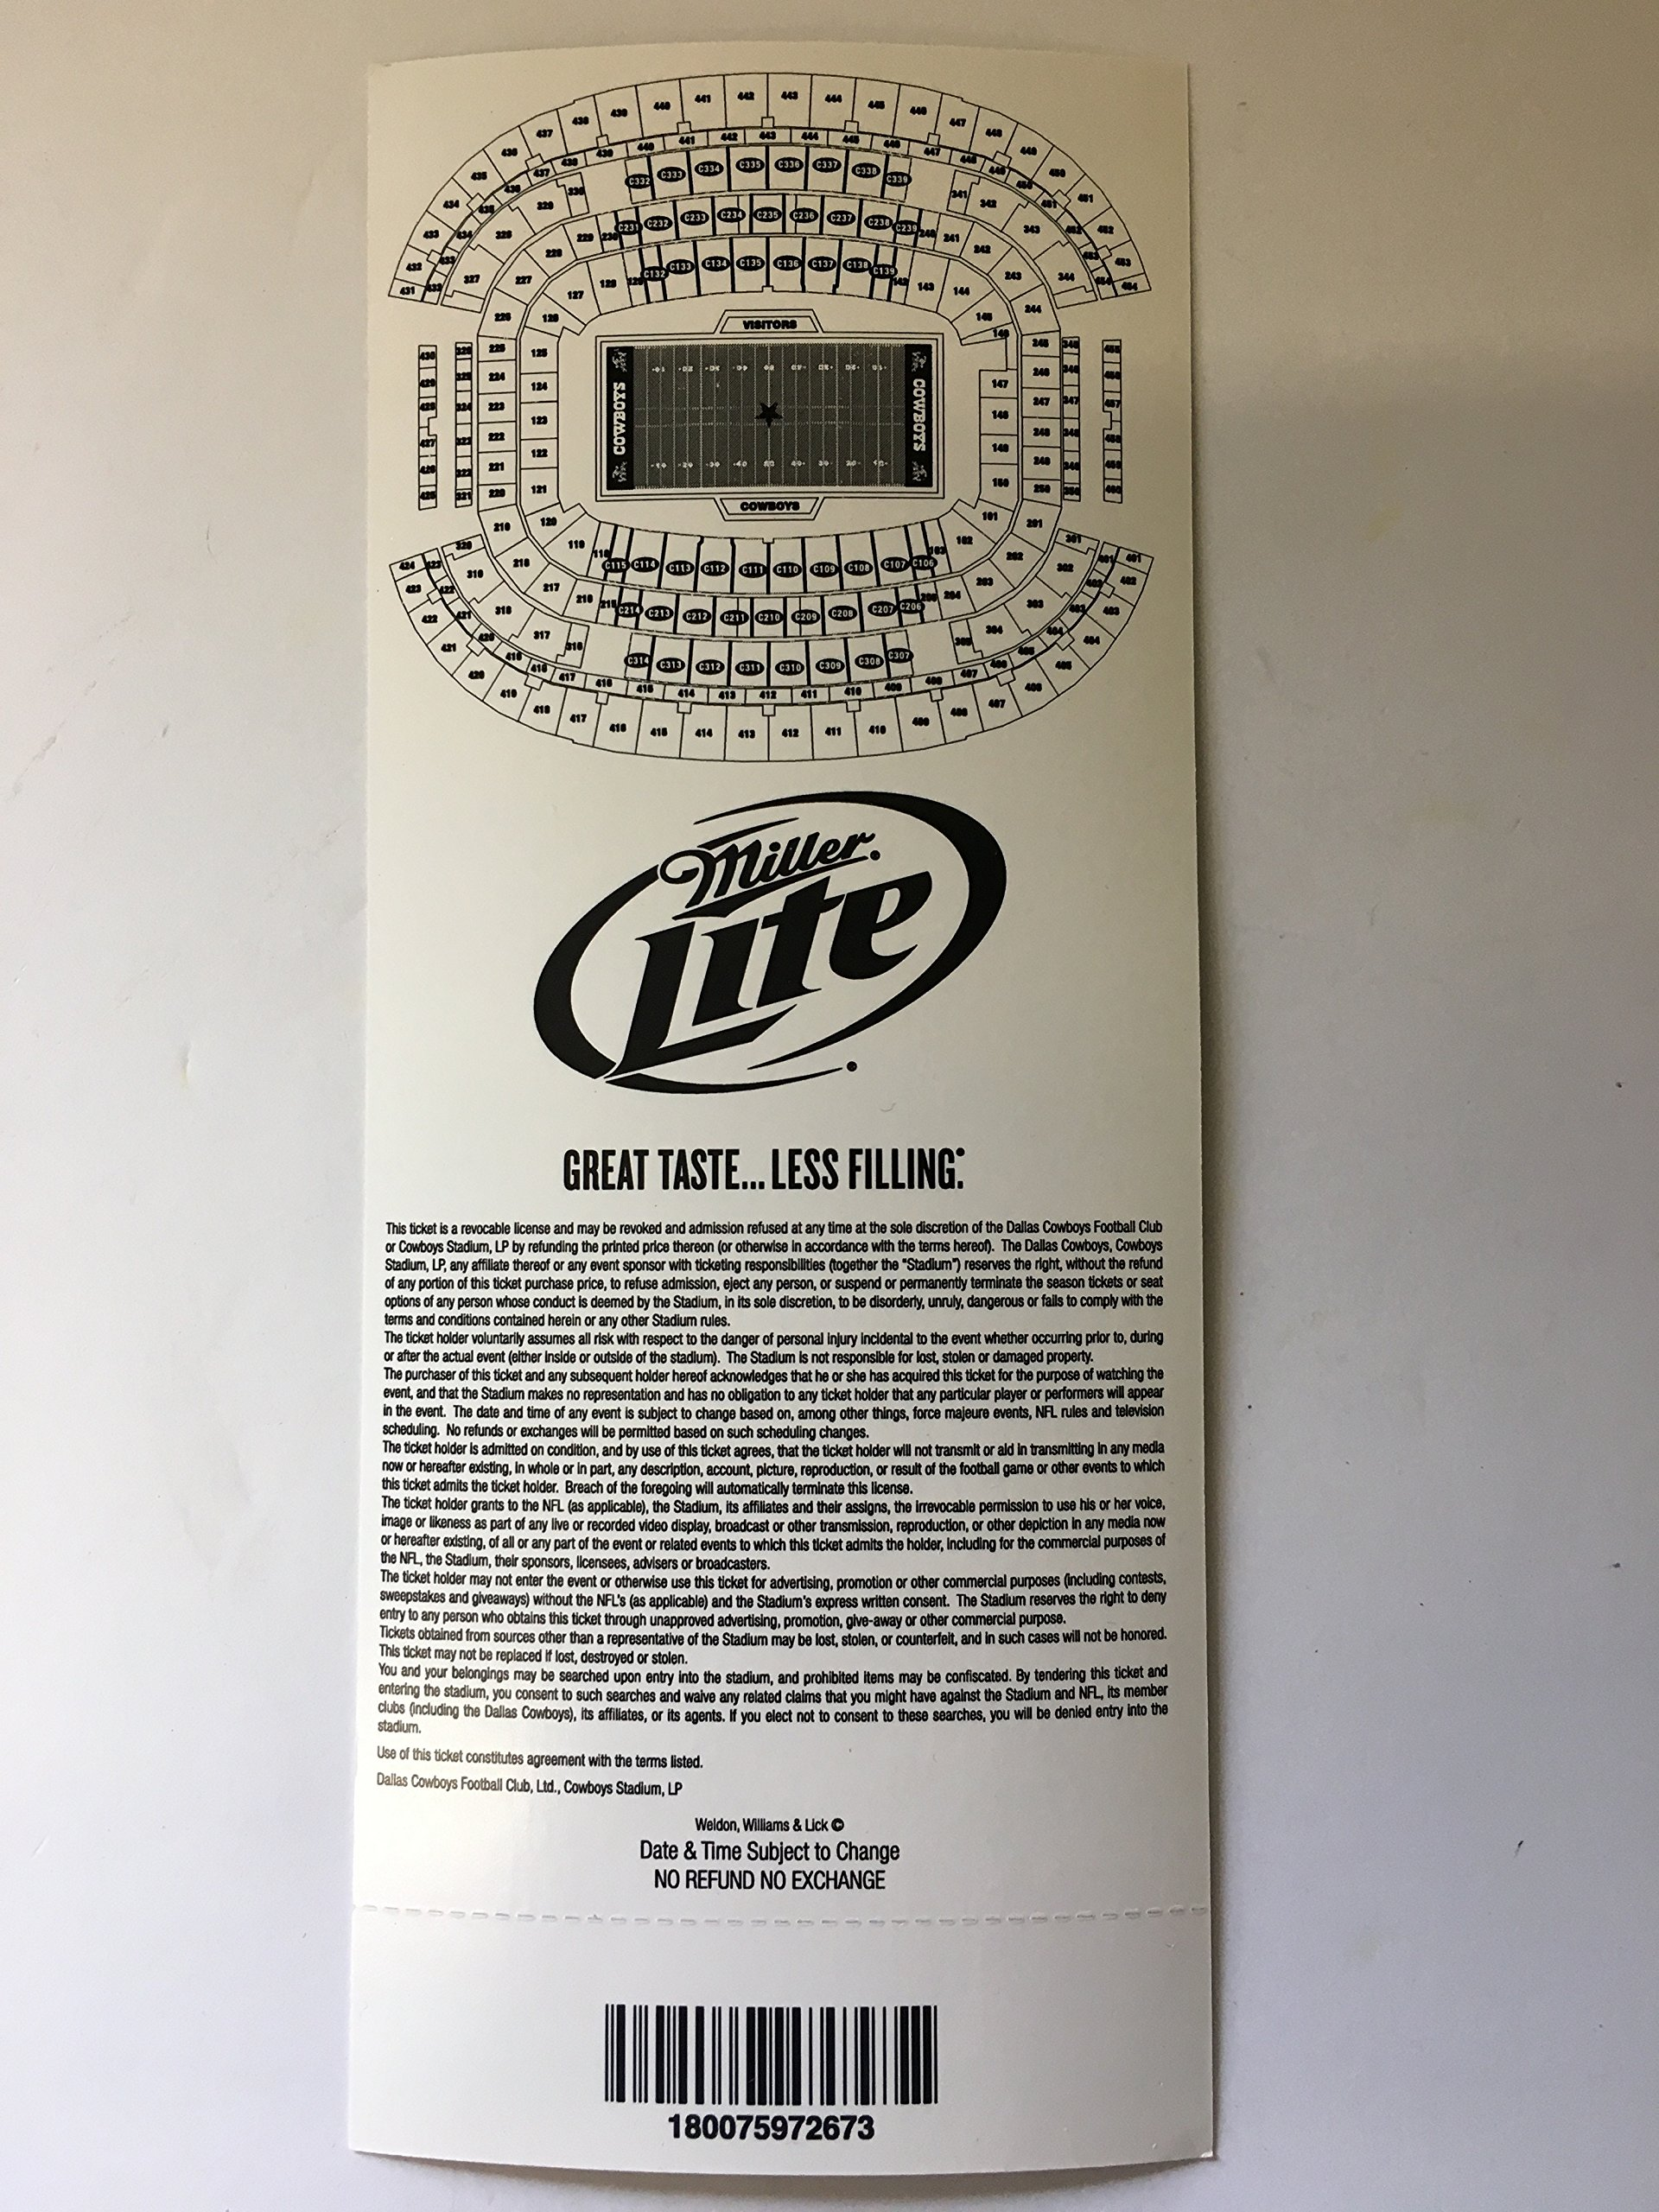 Cowboys Stadium Opening Night Inaugural Season Commemorative Holographic Ticket Stub! Dallas Cowboys vs New York Giants 9/20/09